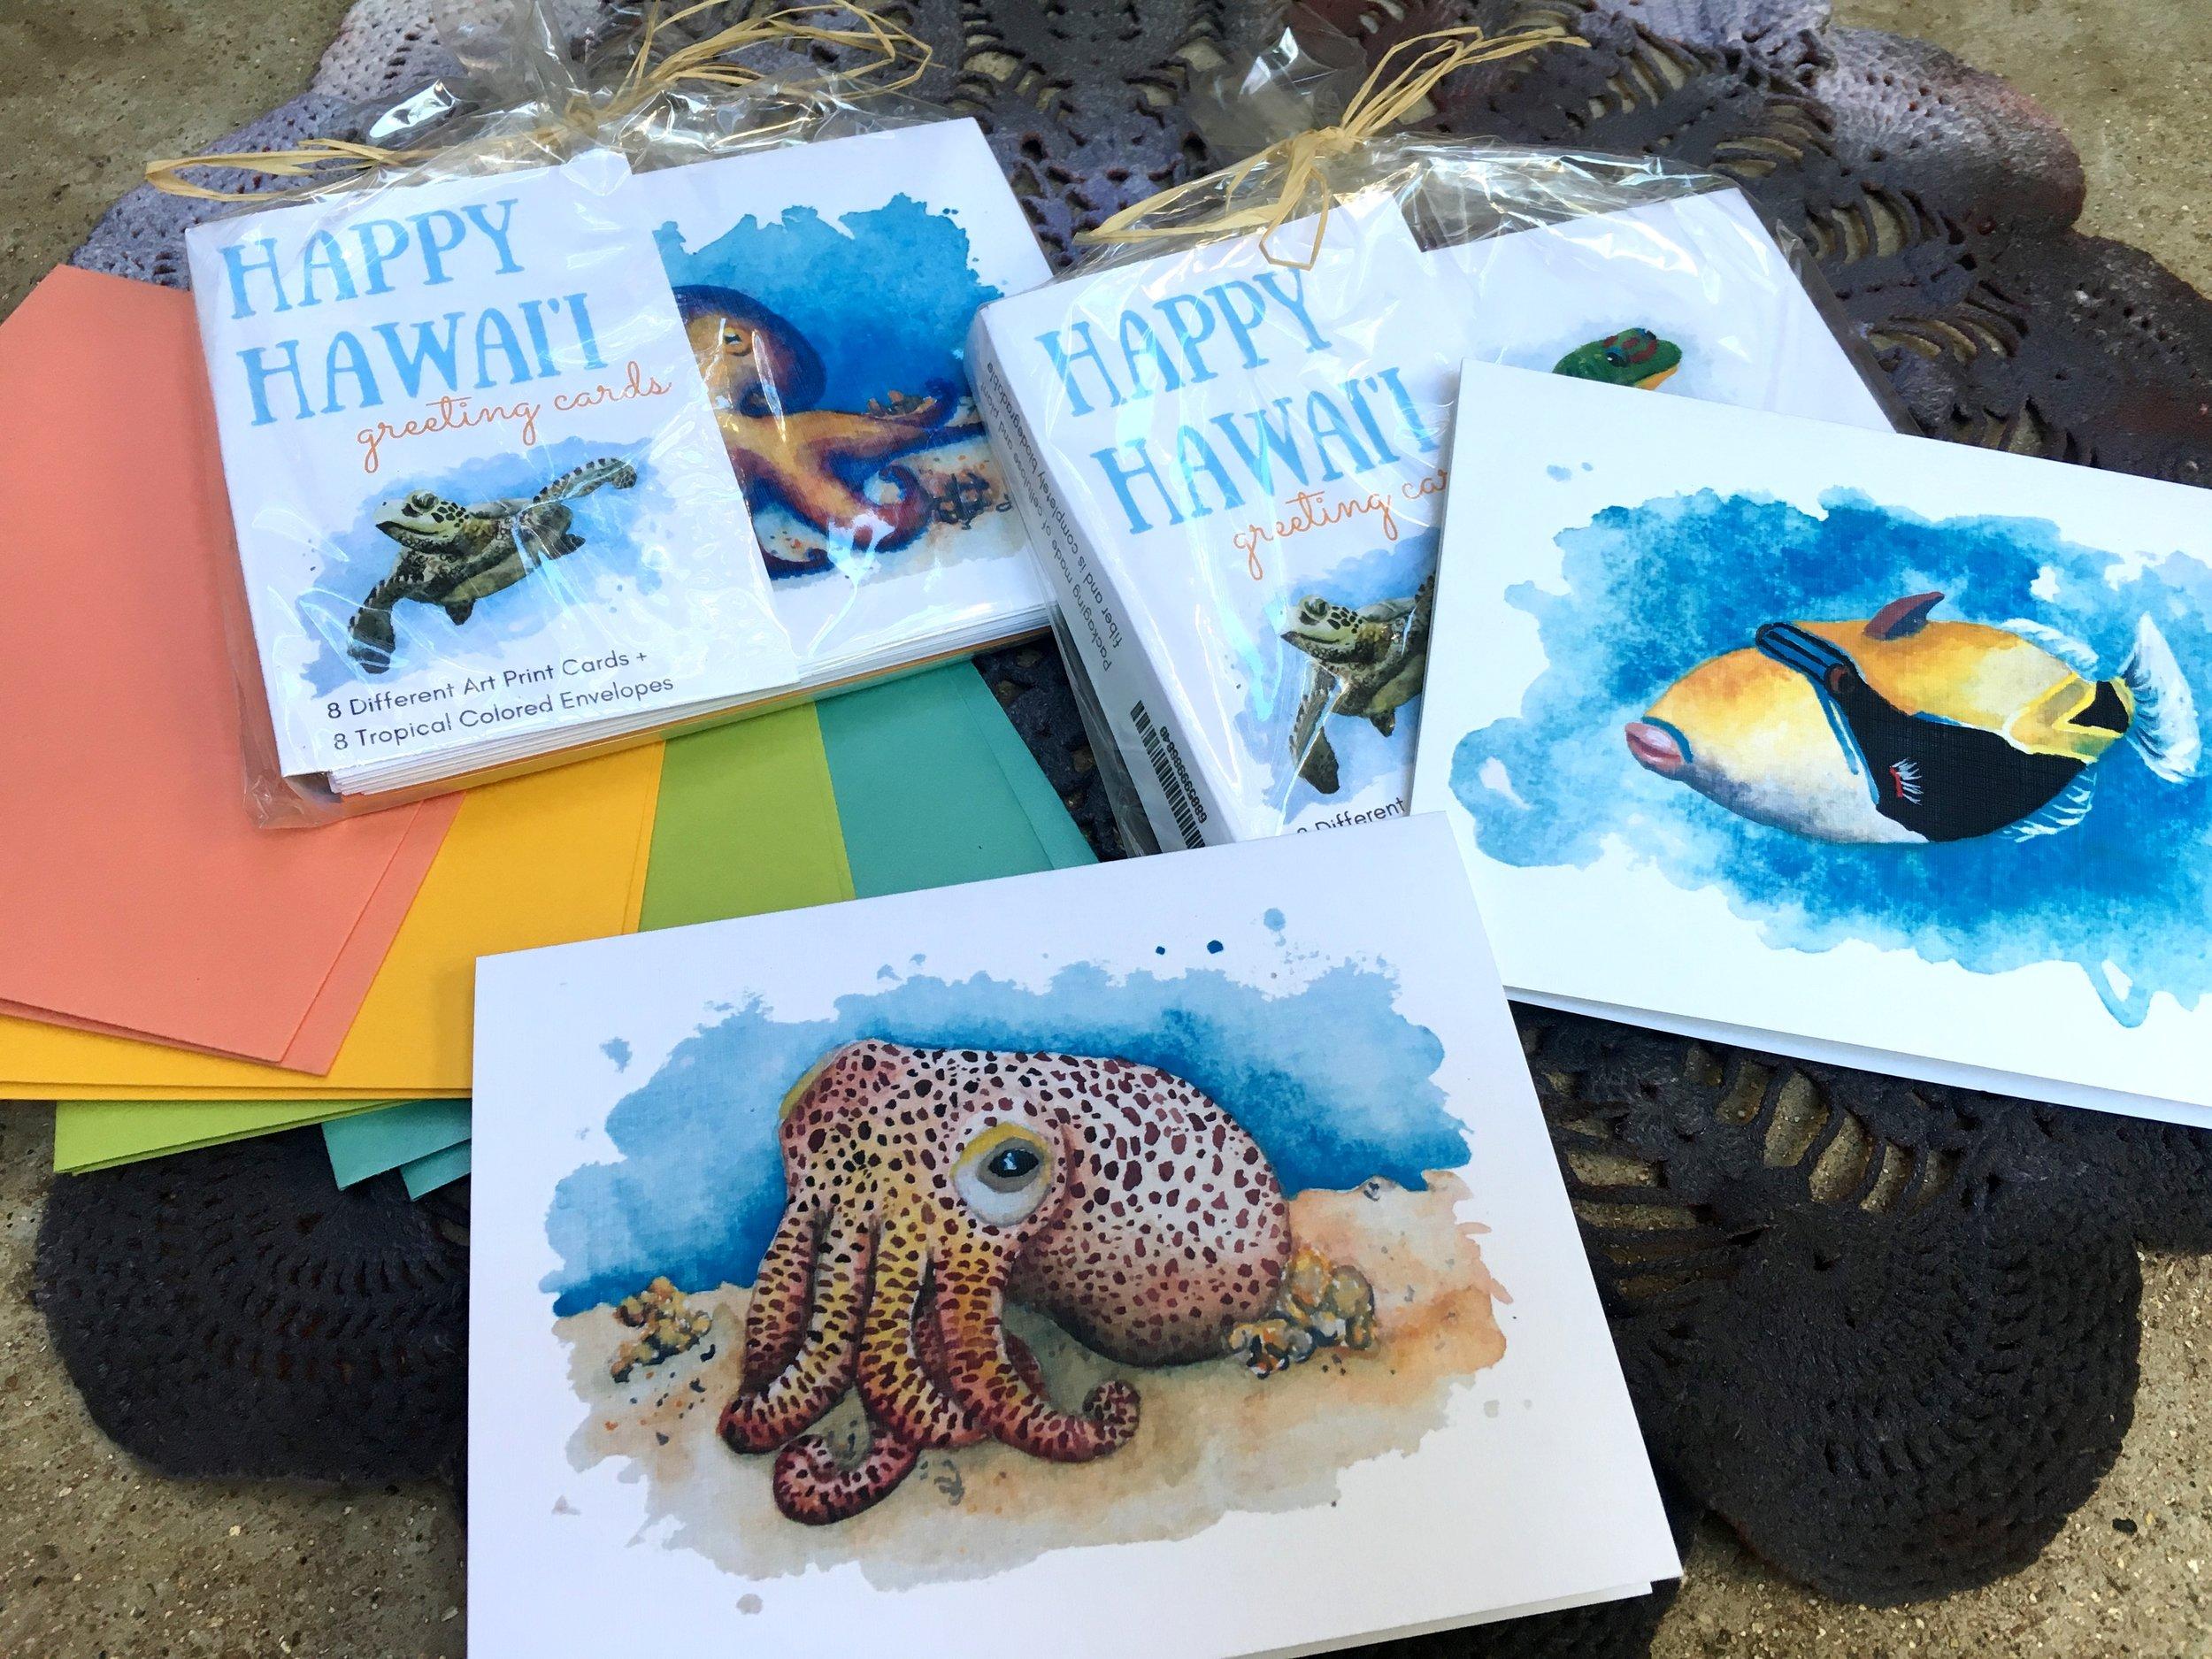 happy hawaii greeting cards